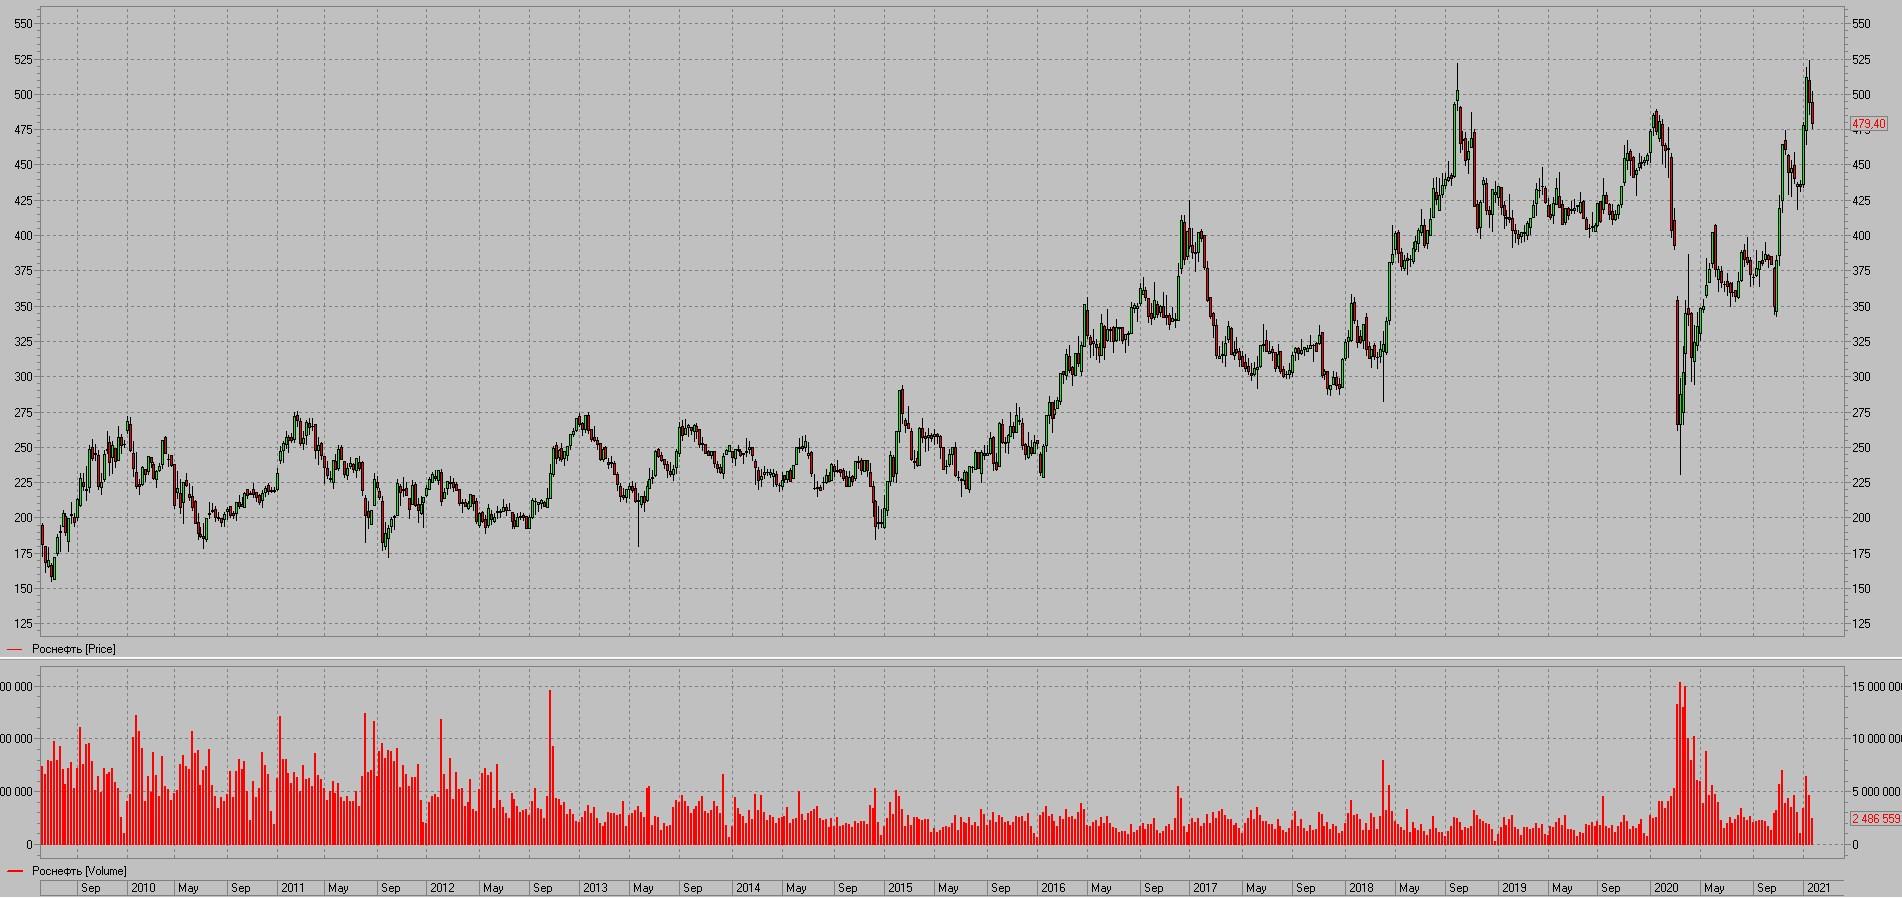 Rosneft shares